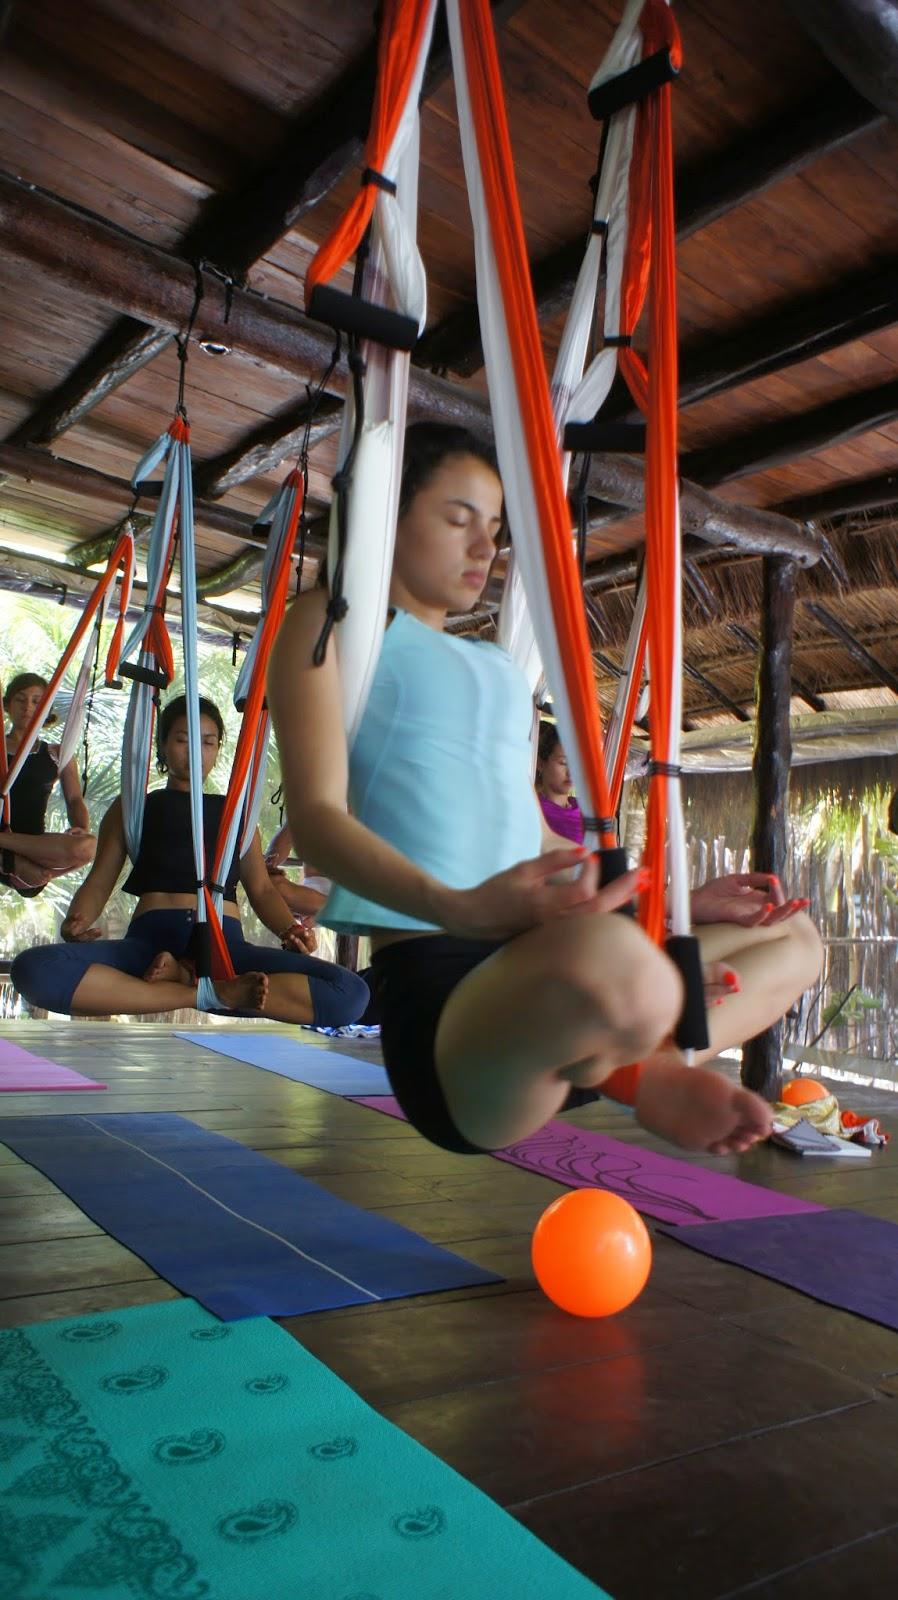 Aeroyoga - Yoga en el Aire